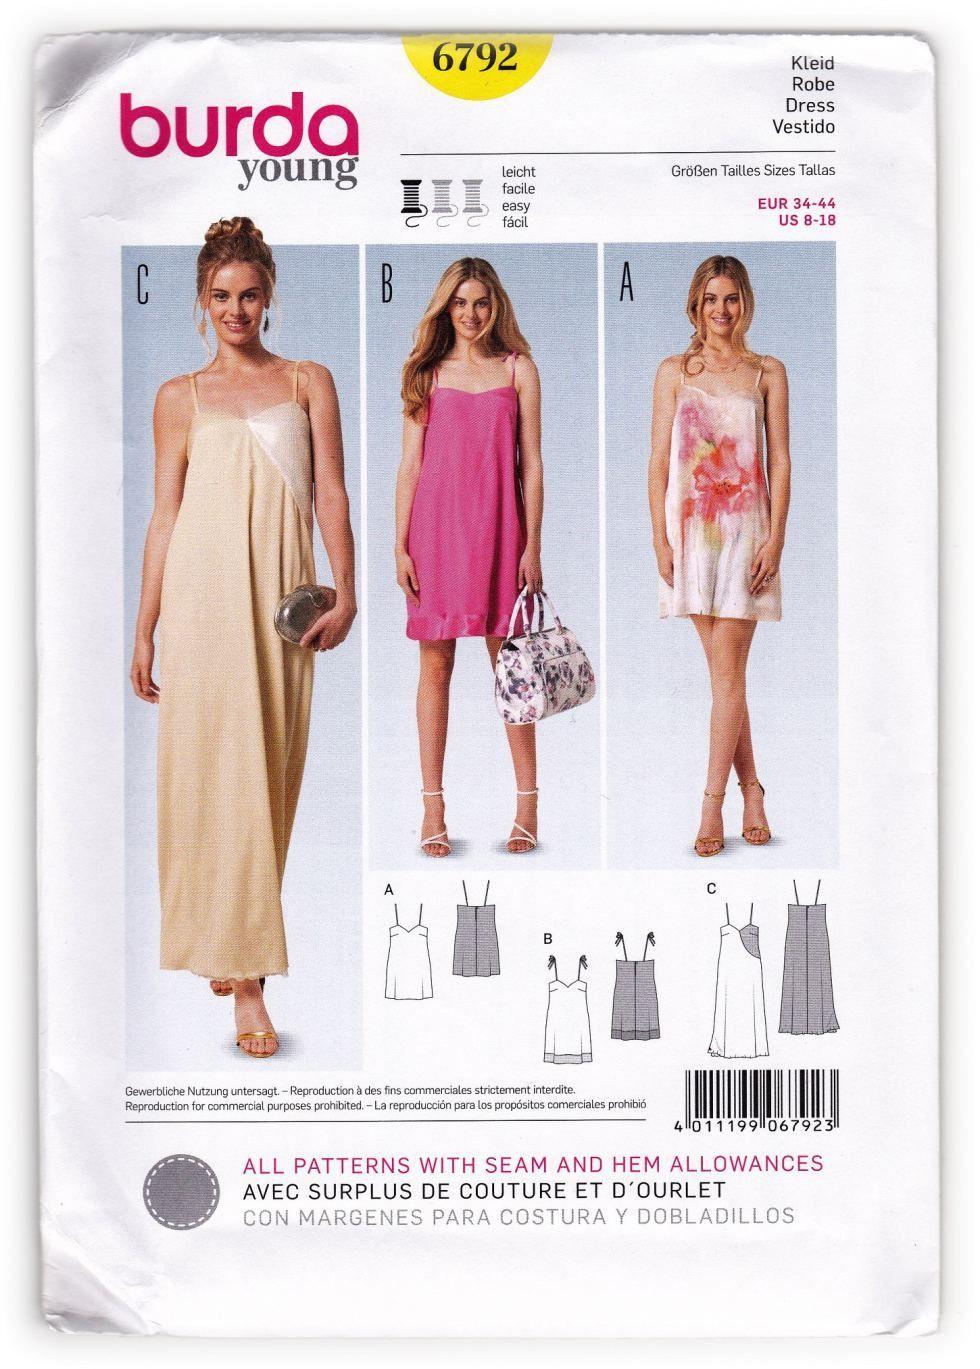 Young Women\'s Slip Dress Sewing Pattern Burda 6792 Miss 8-18 | Burda ...